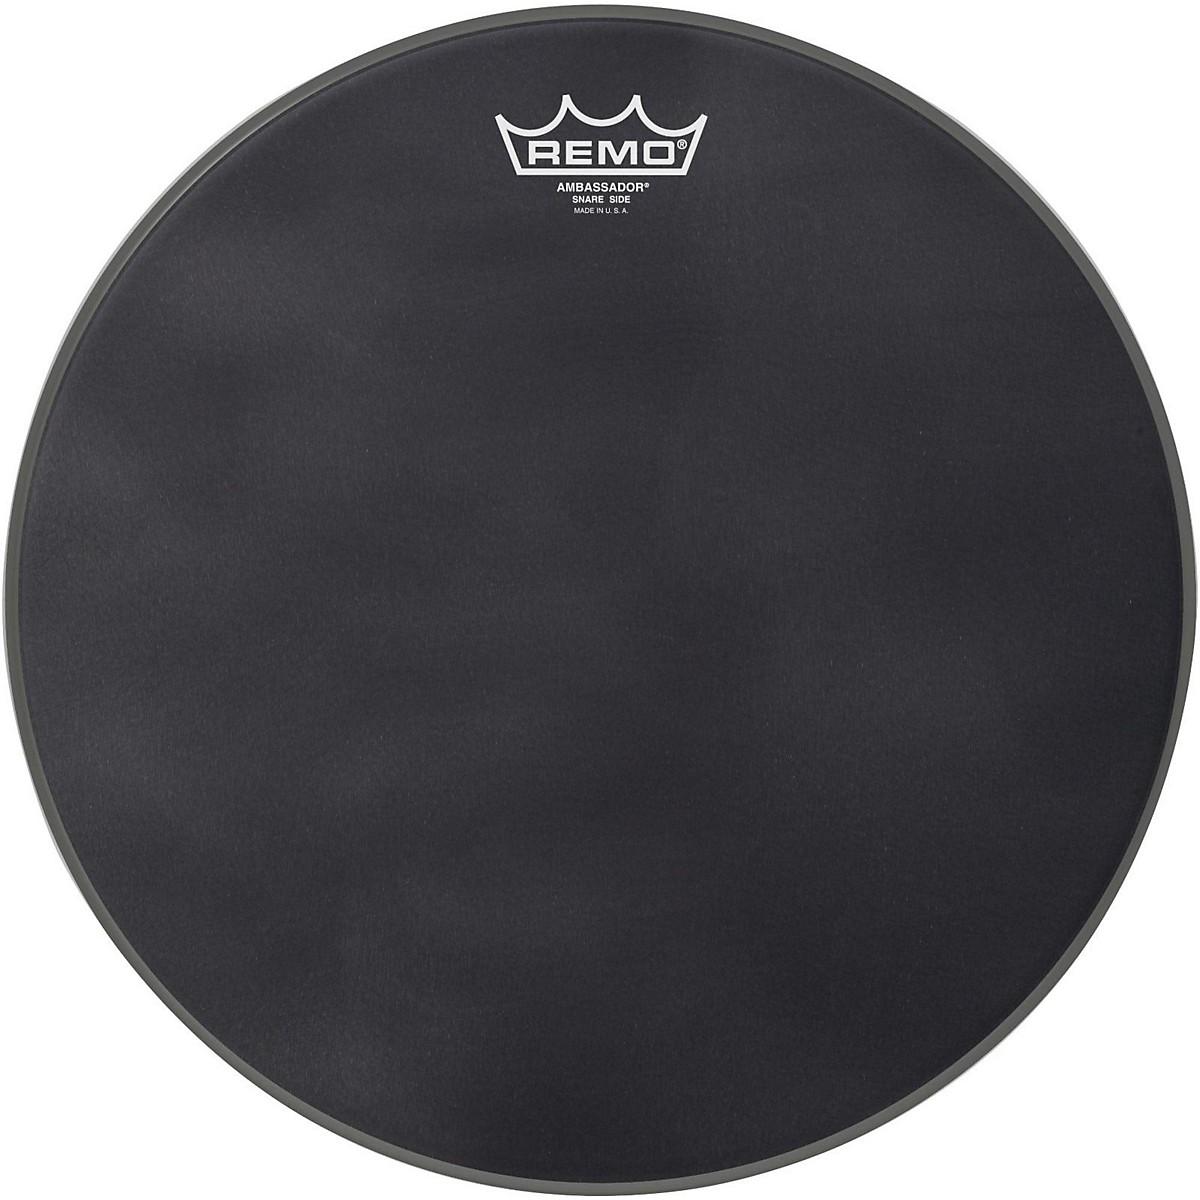 Remo Ambassador Black Suede Snare Side Drum Head